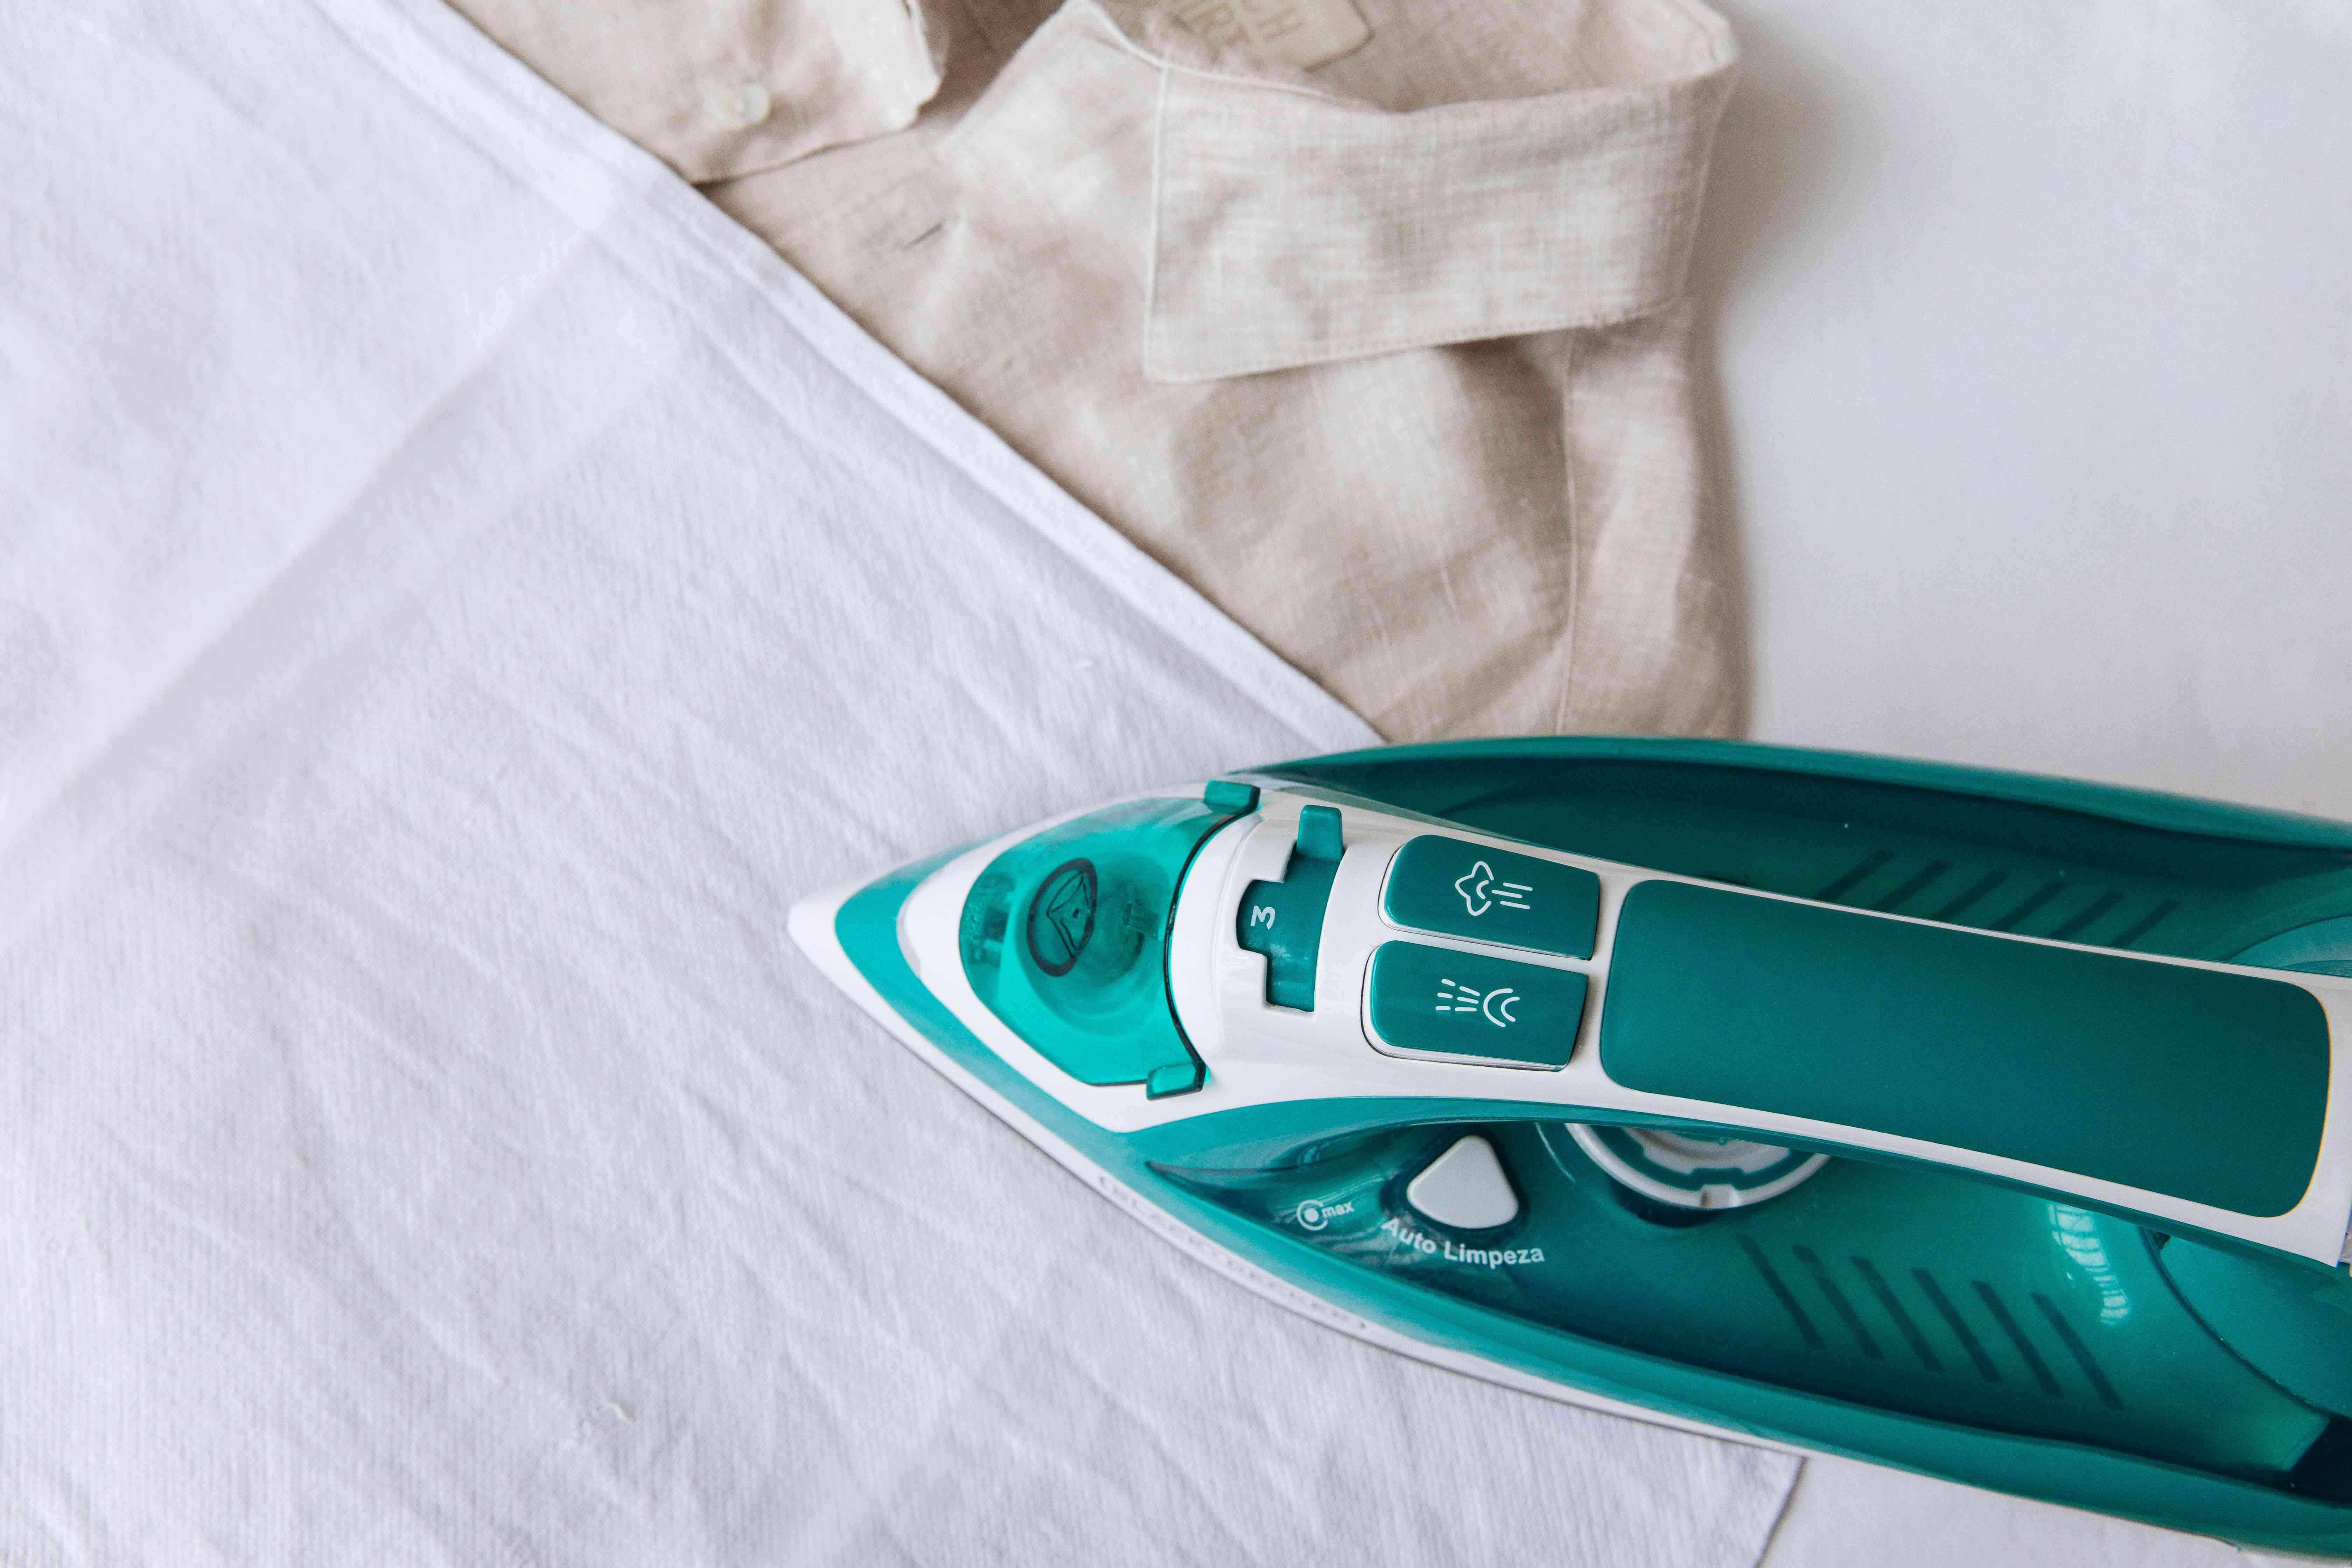 using a pressing cloth to iron a linen shirt